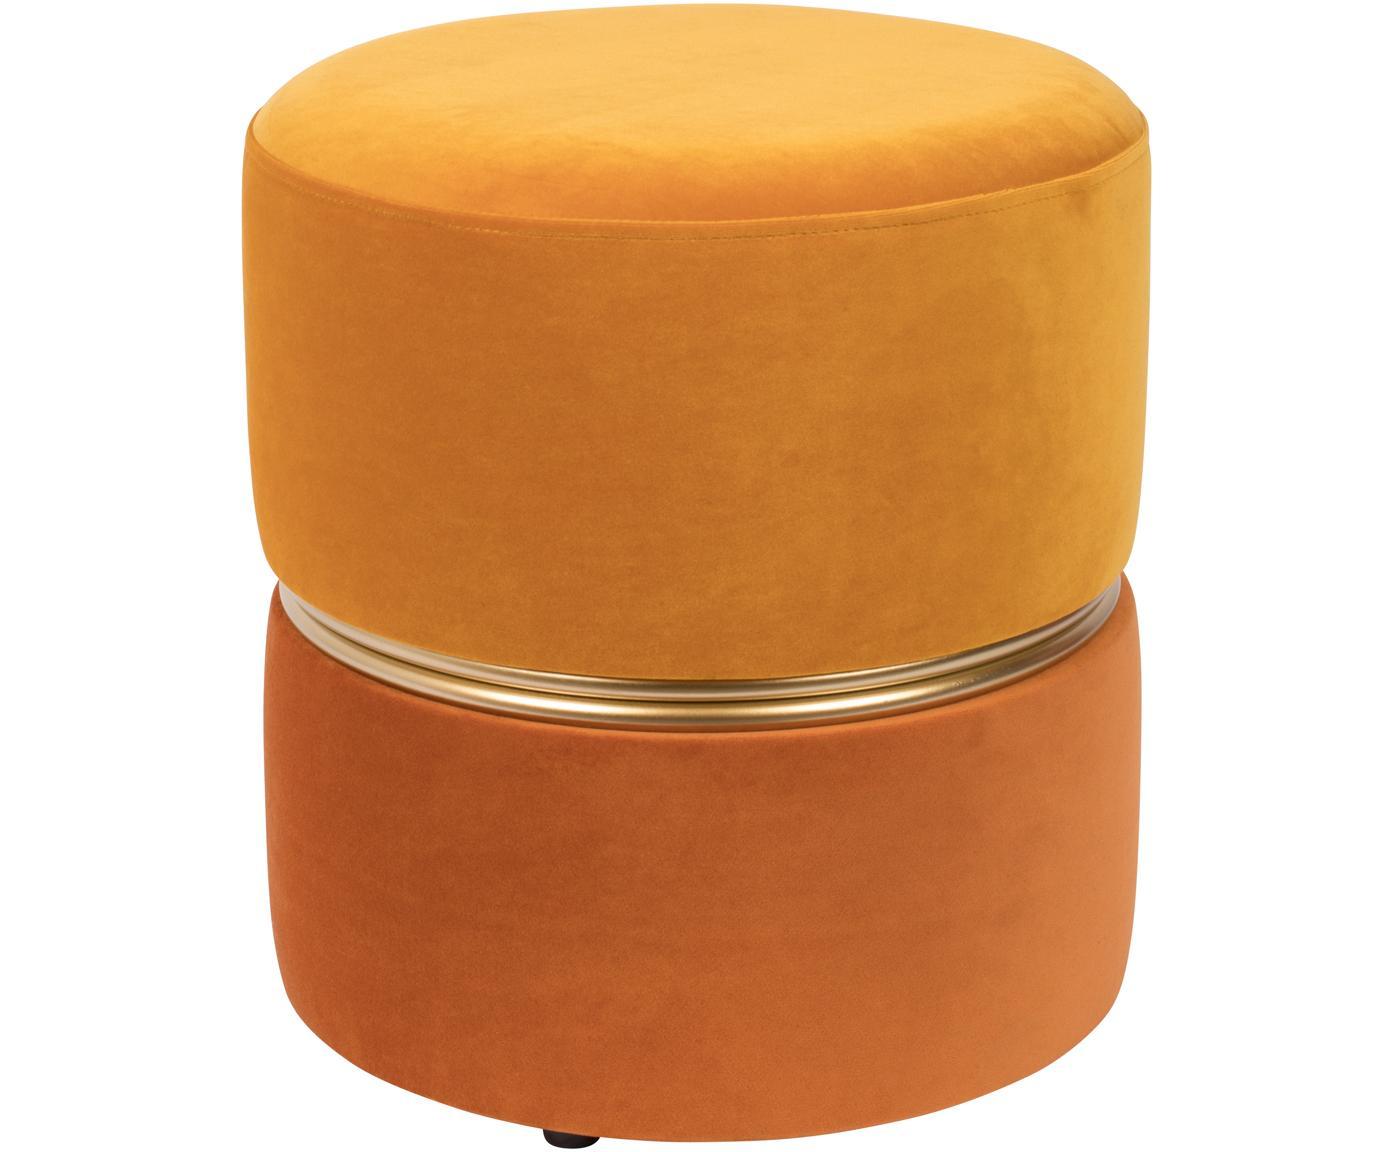 Fluwelen poef Bubbly, Bekleding: polyester fluweel, Frame: MDF, grenenhout, Geeltinten, Ø 35 x H 39 cm